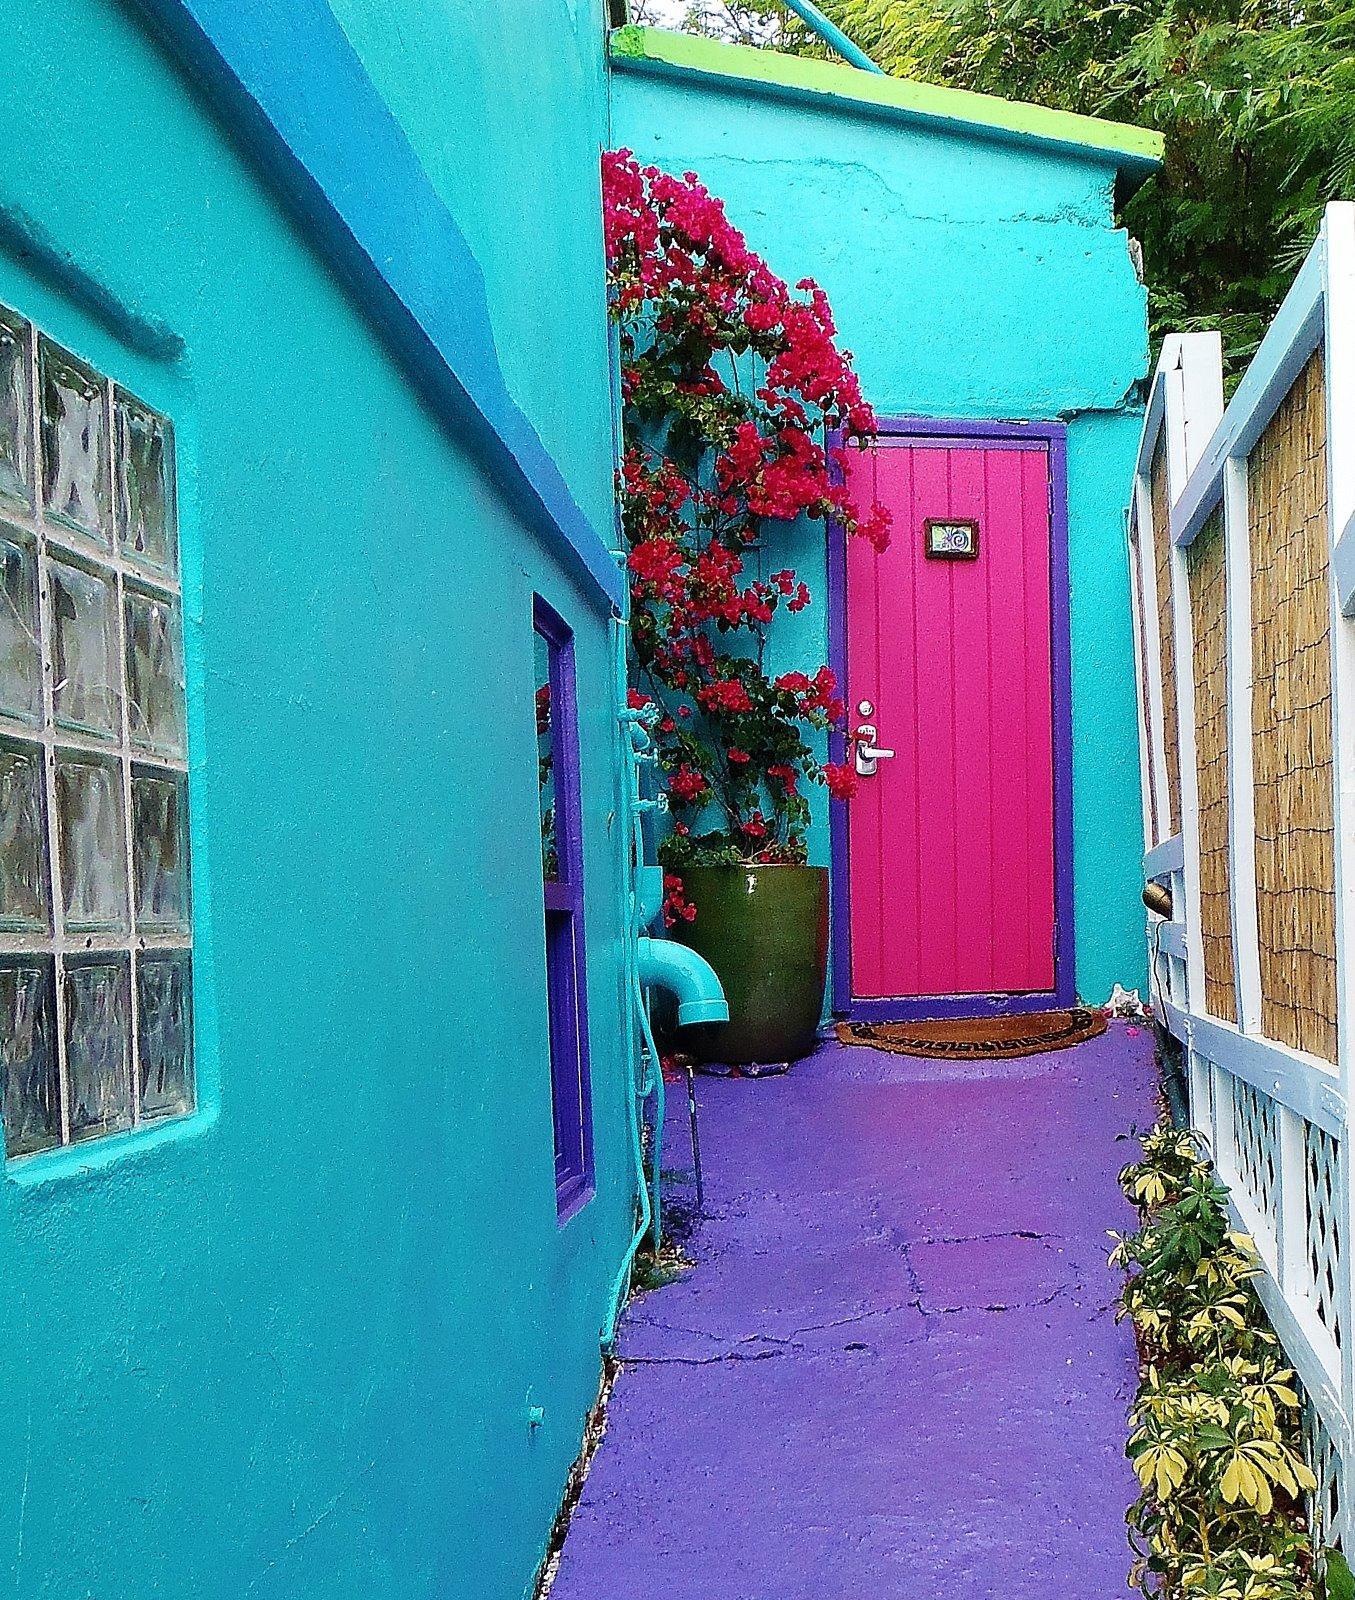 008 Colorful Caribbean flair